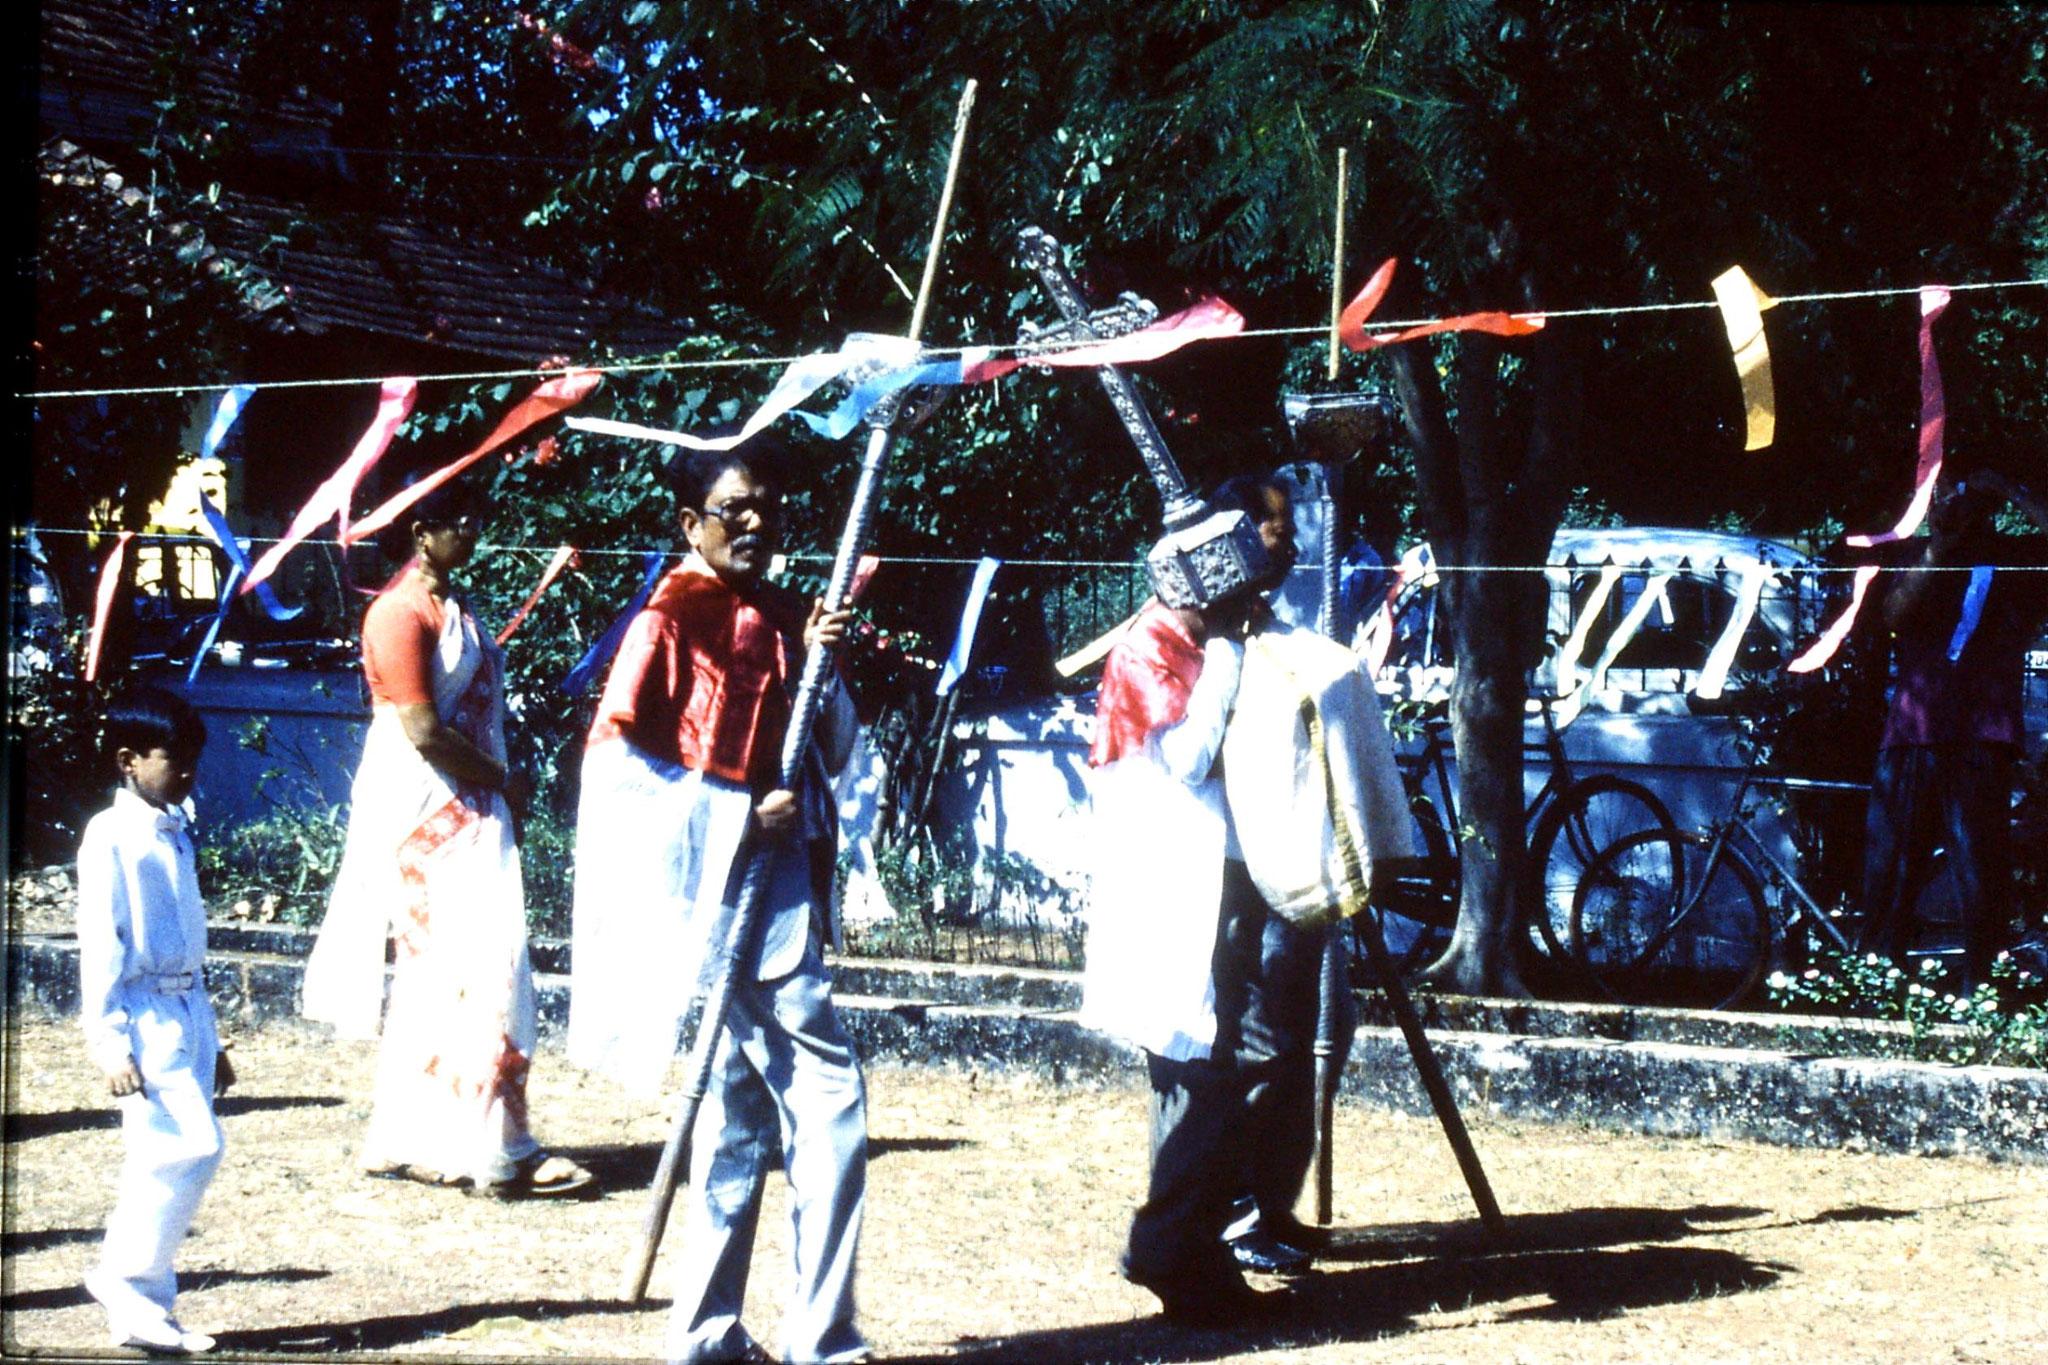 31/12/1989: 12: Siolim church and 10.30 mass procession